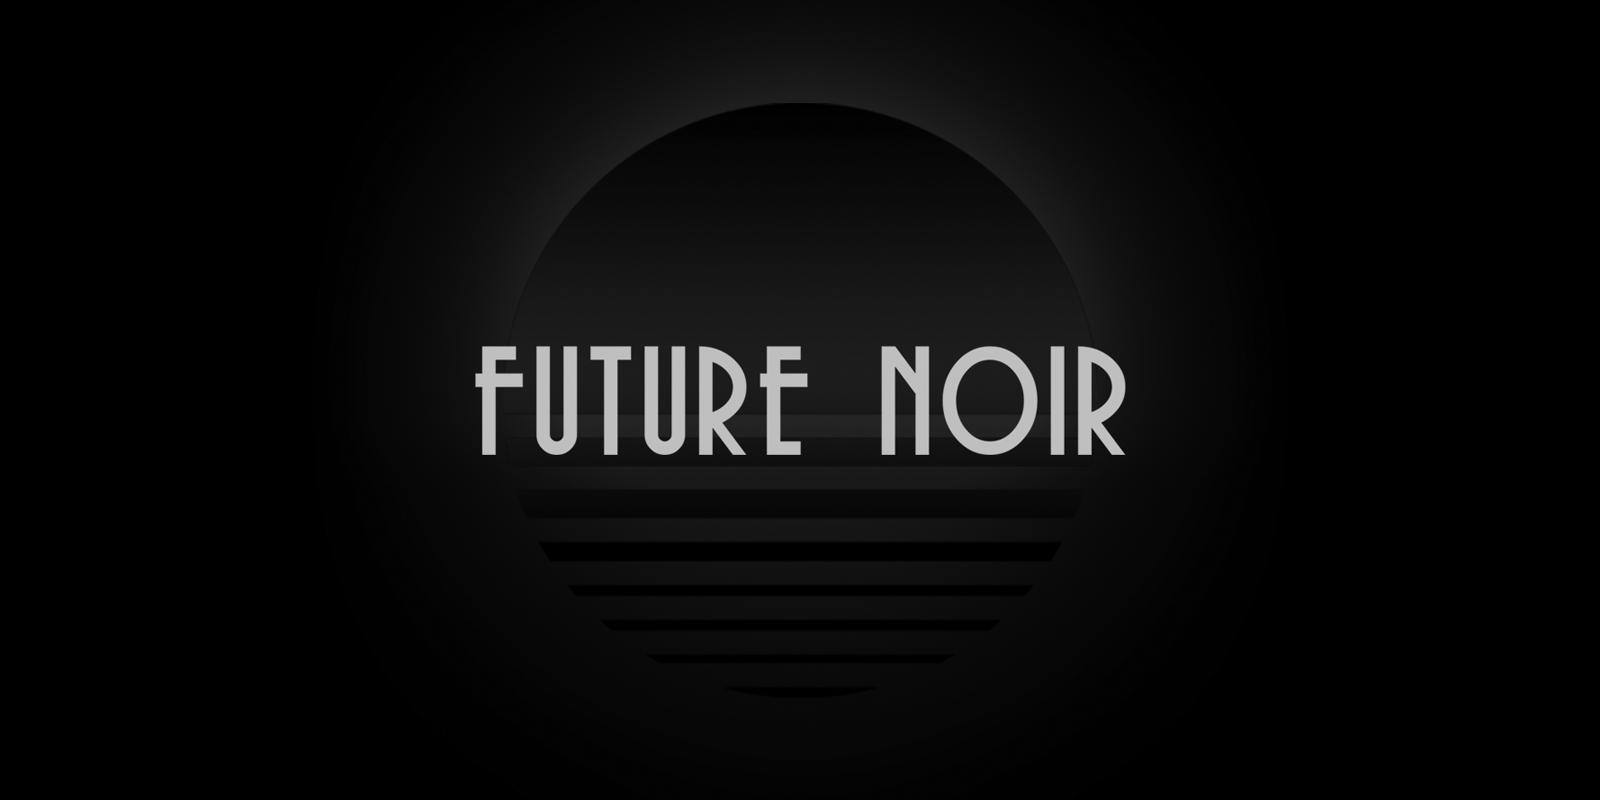 #futurenoir